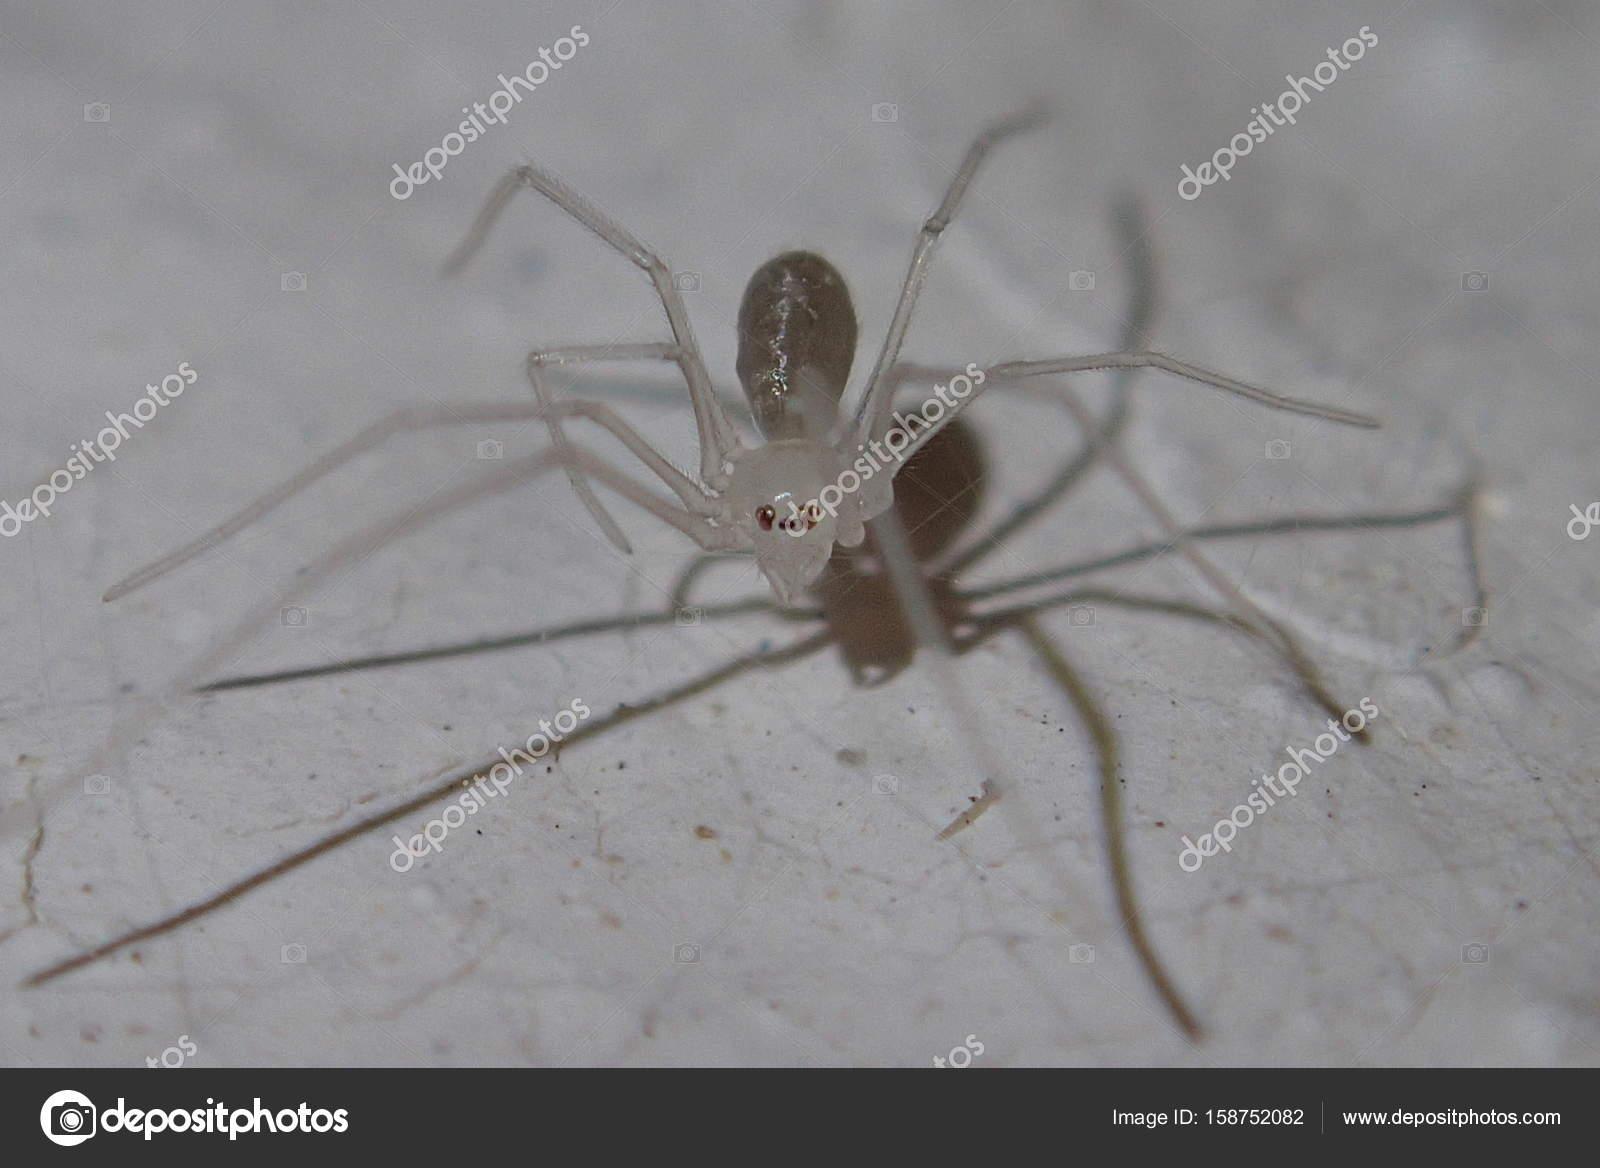 Baby-Schädel-Spinne — Stockfoto © JakeE #158752082